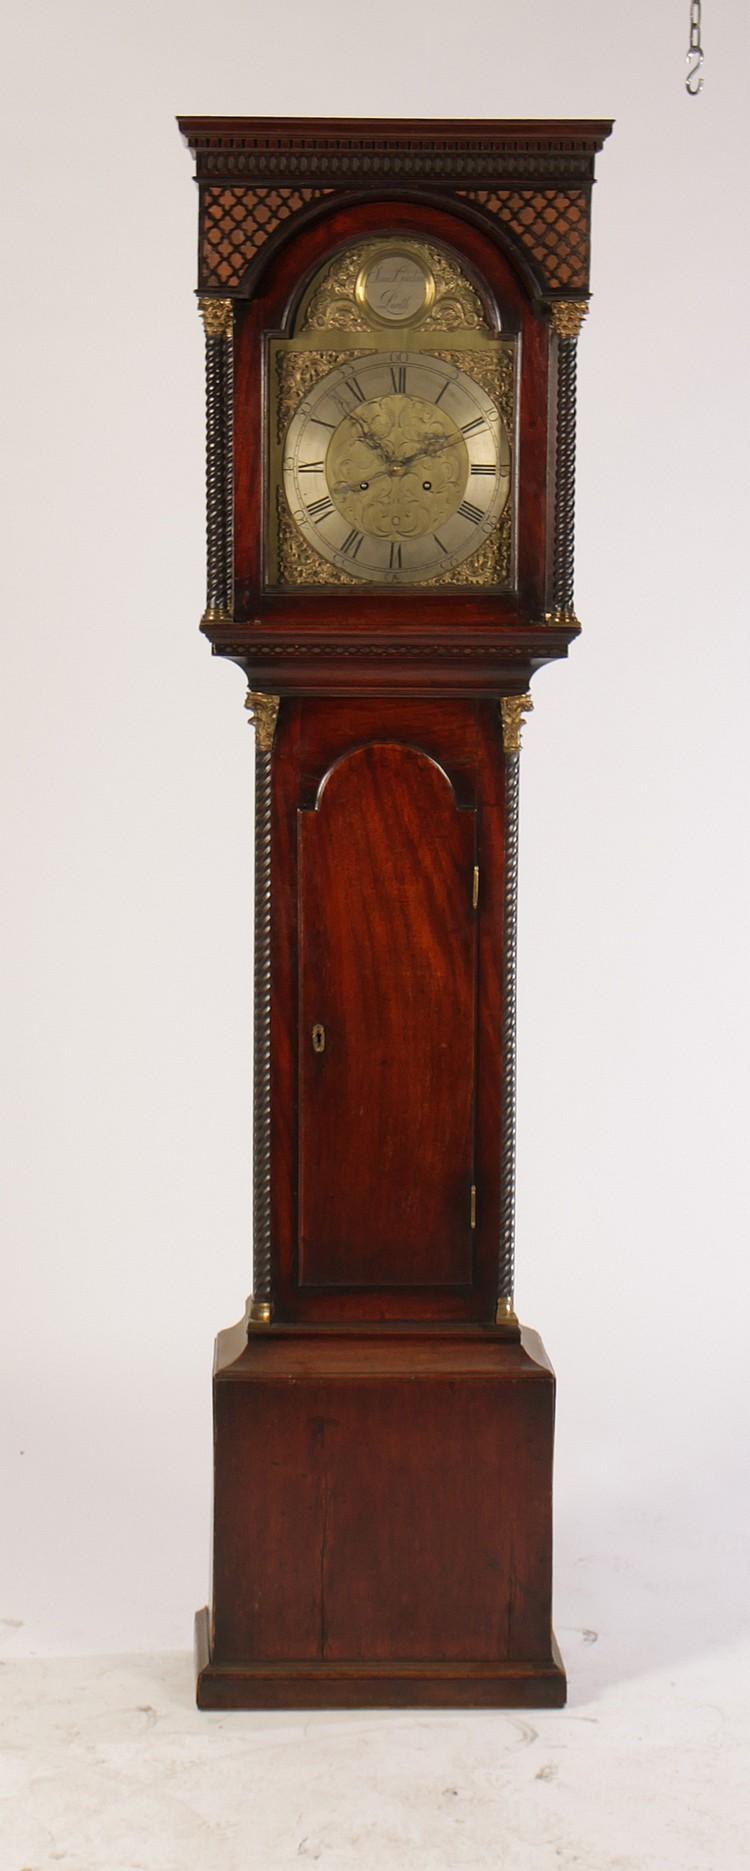 James Gordon Perth Tall Case Clock Circa 1880